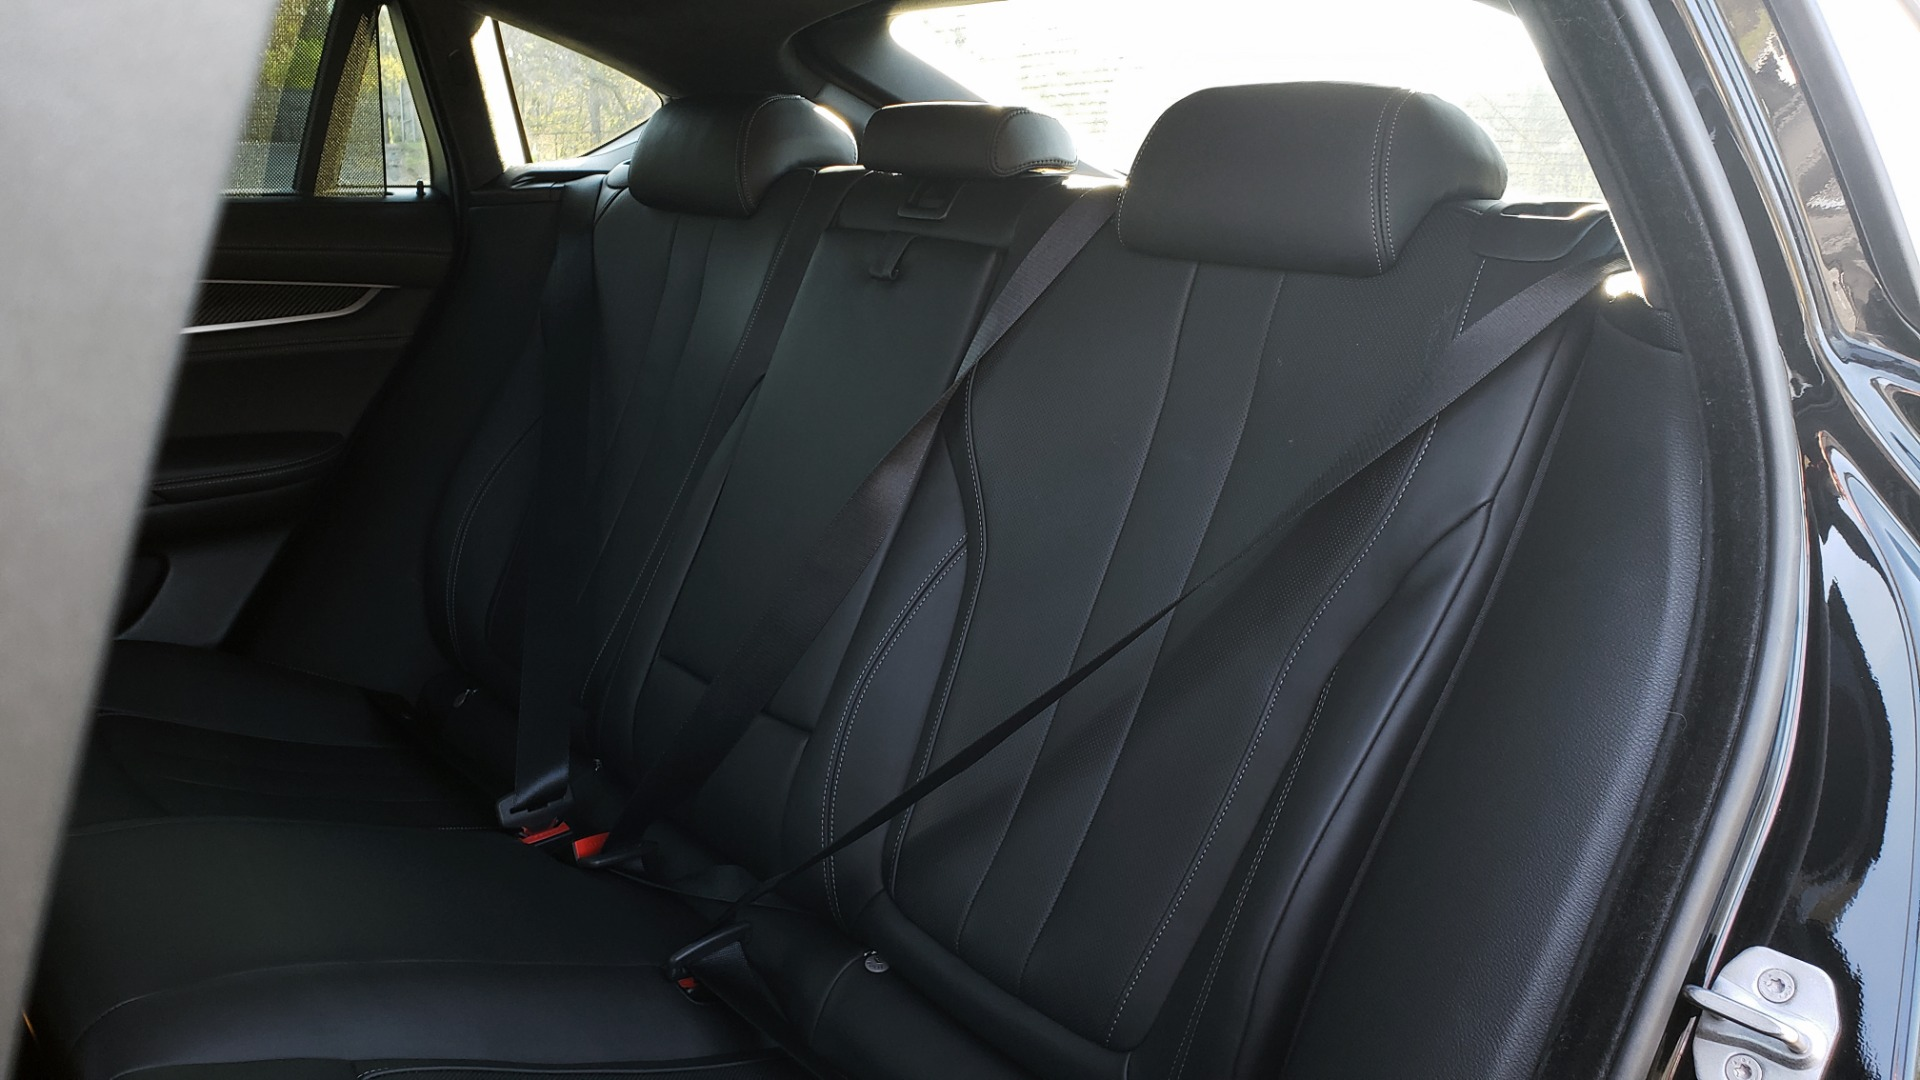 Used 2016 BMW X6 M EXEC PKG / DRVR ASST / NAV / SUNROOF / BLIND SPOT / REARVIEW for sale Sold at Formula Imports in Charlotte NC 28227 65